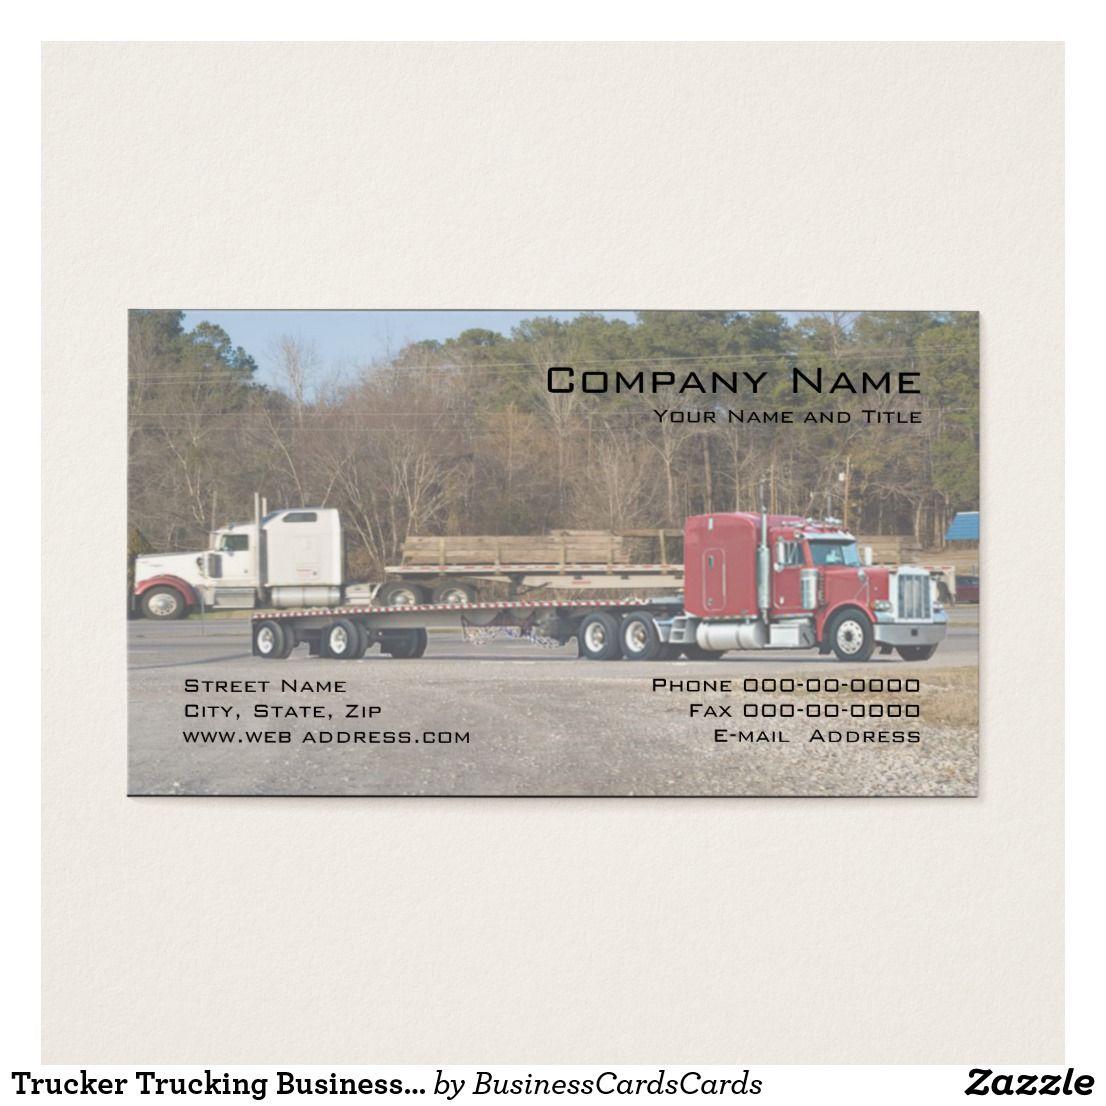 Trucker Trucking Business Card | Pinterest | Business cards and Business